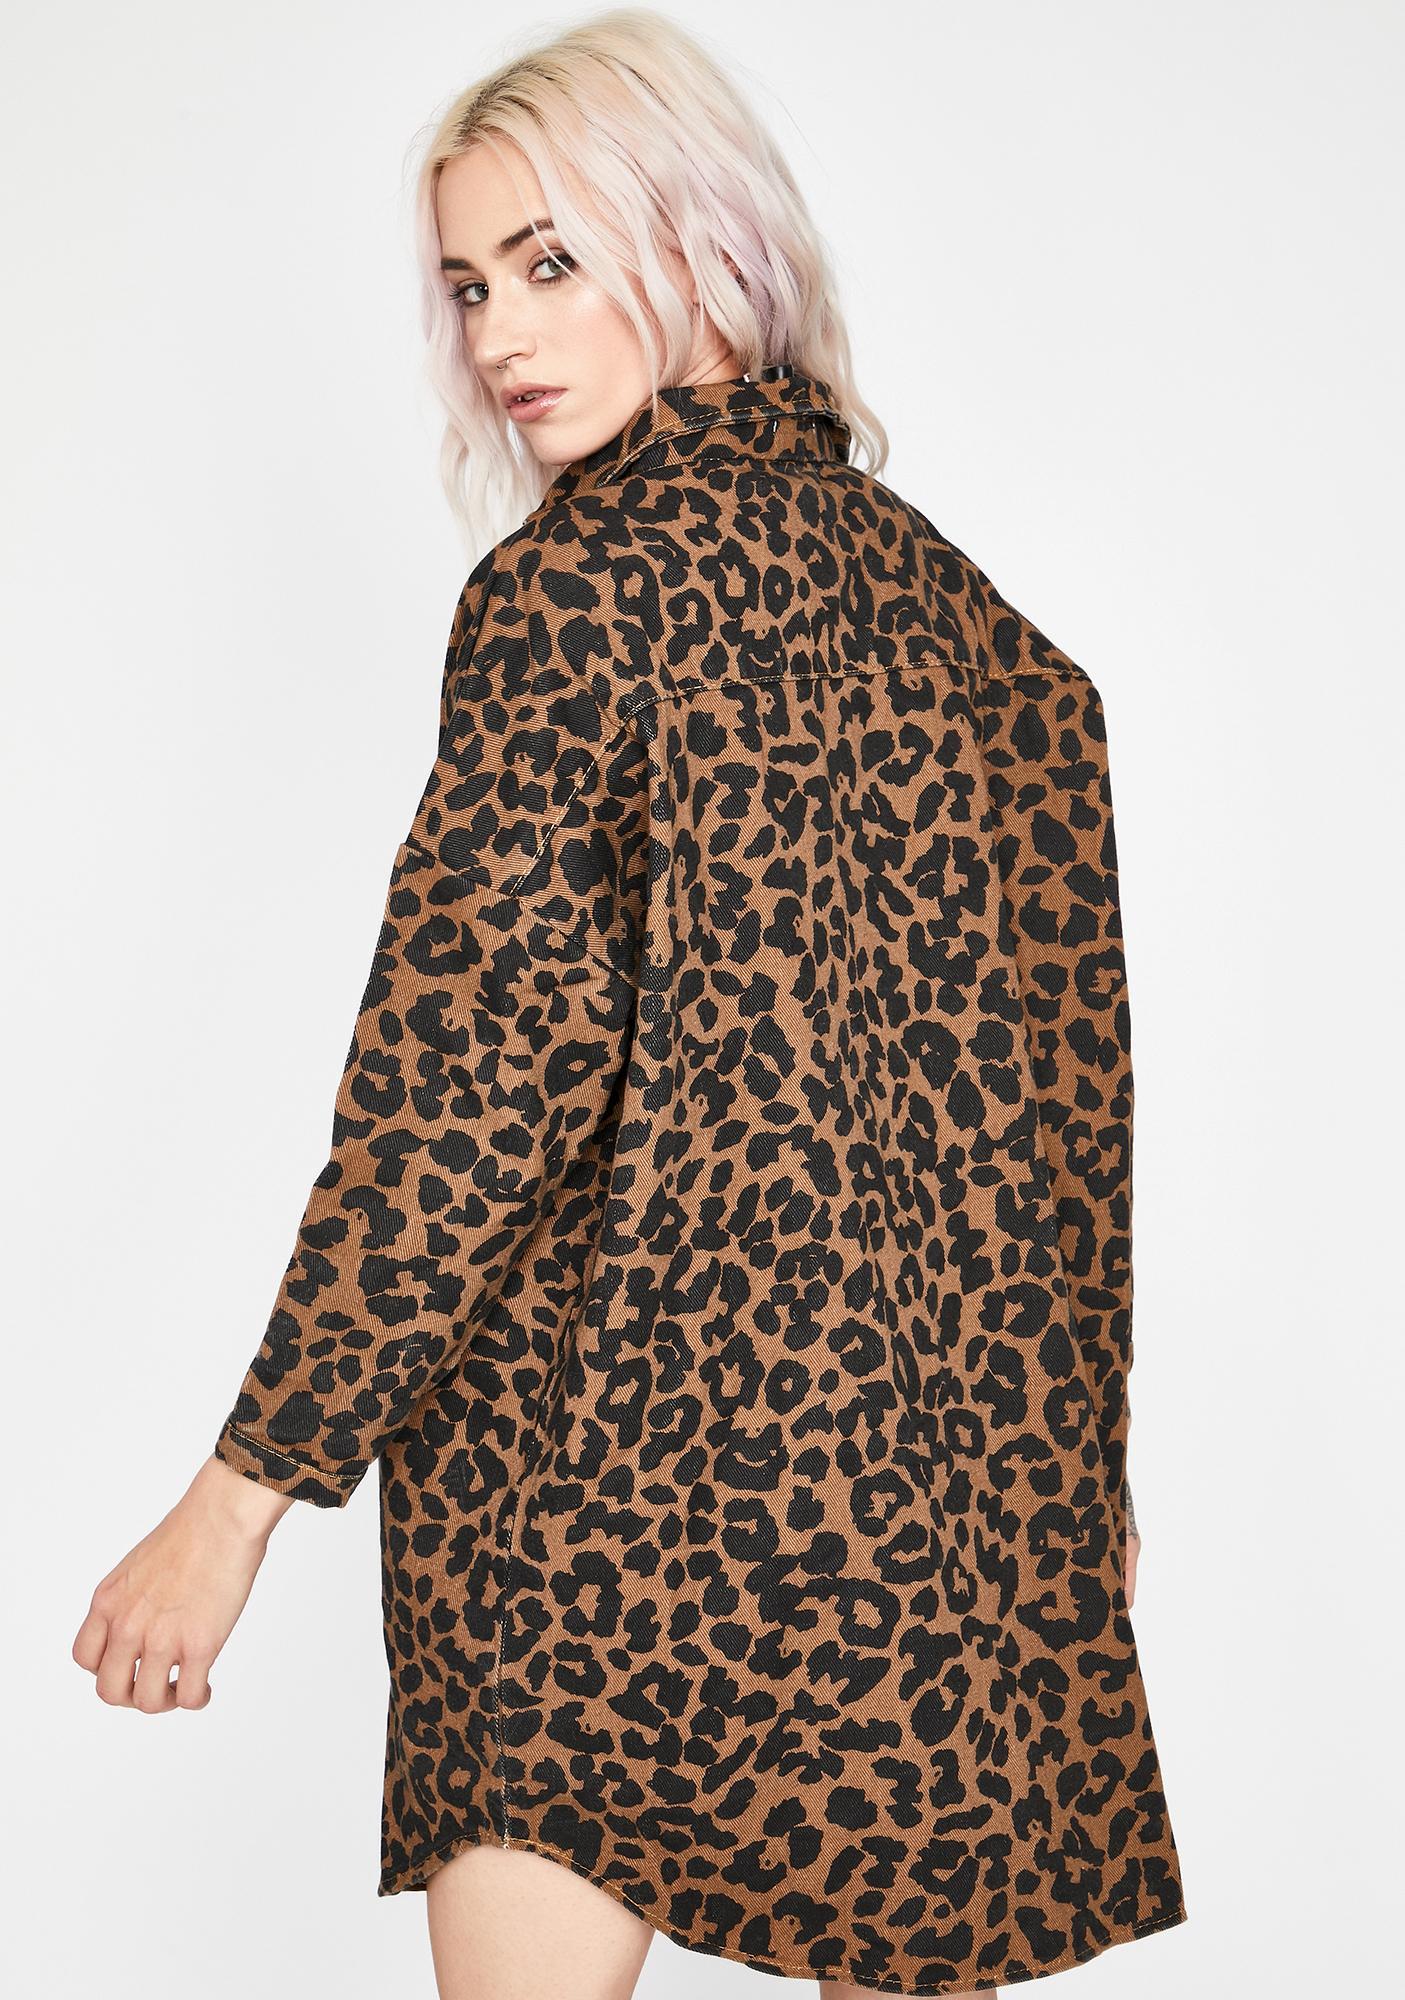 Killa Kitty Denim Jacket